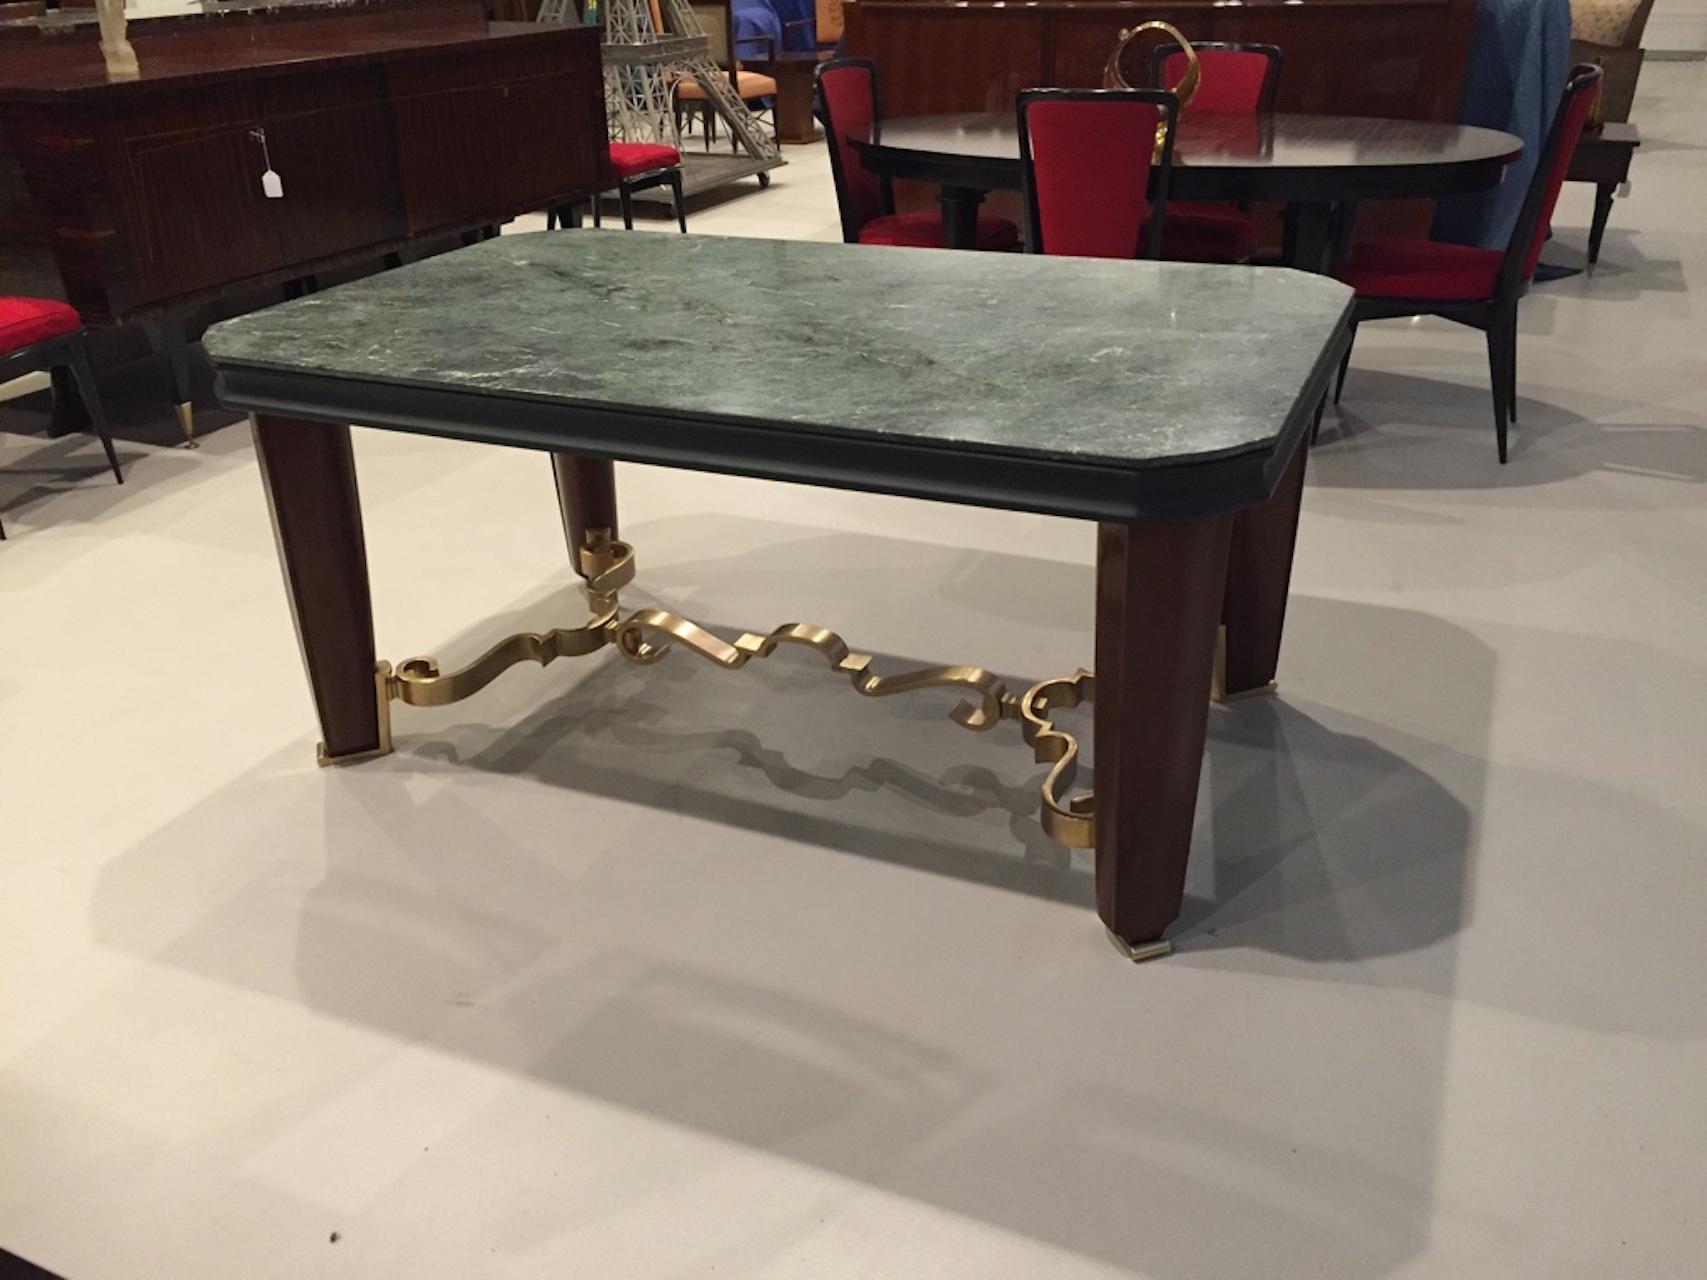 Marble Table Tops Nz Side Table Coffee Table Wrought Iron  : thumbIMG28431024 from www.theridgewayinn.com size 1707 x 1280 jpeg 392kB